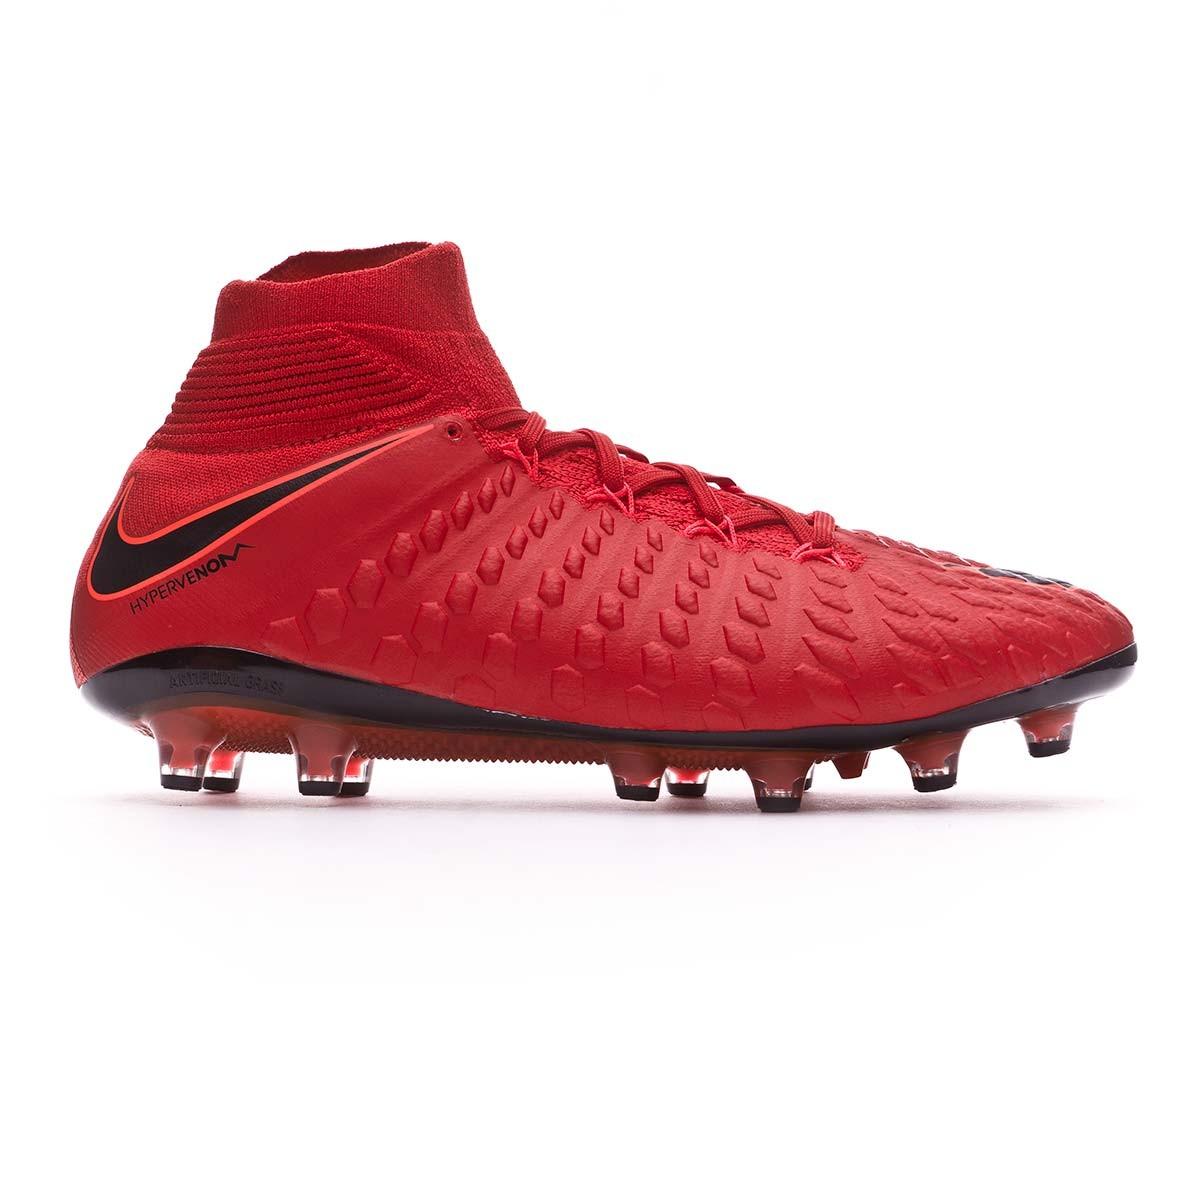 36e9f6eac38 Football Boots Nike Hypervenom Phantom III DF ACC AG-Pro University red -Black-Bright crimson - Football store Fútbol Emotion